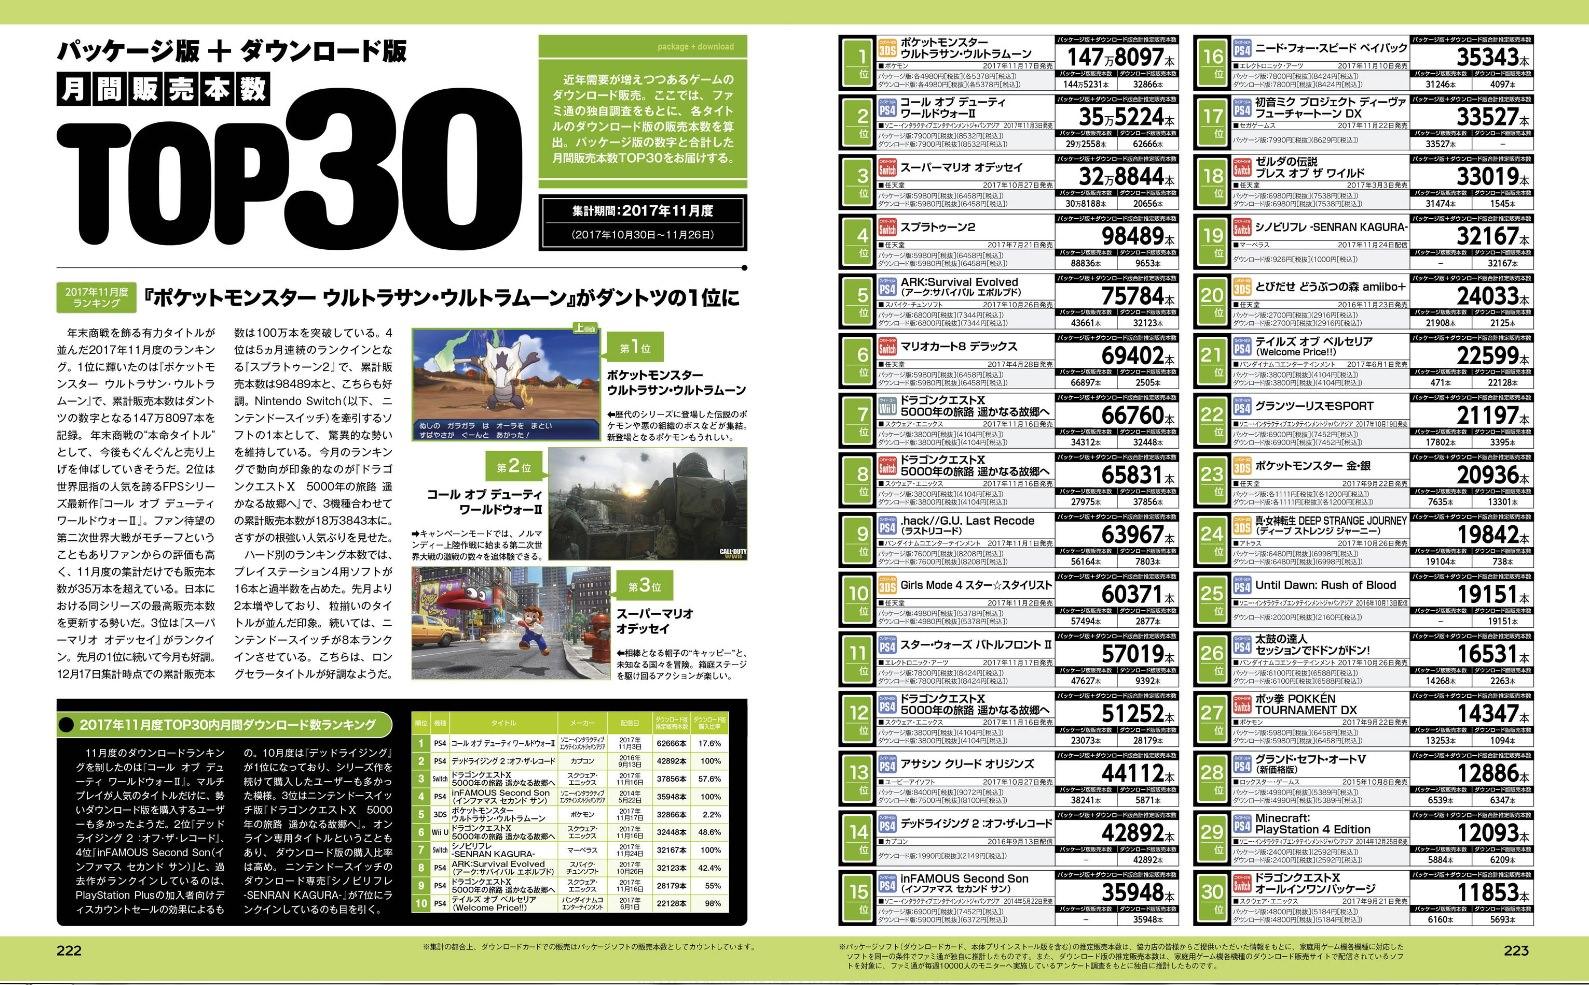 F3kX5tiFrSQgC - 日野「レベルファイブ20周年記念作品はオンラインゲーム」